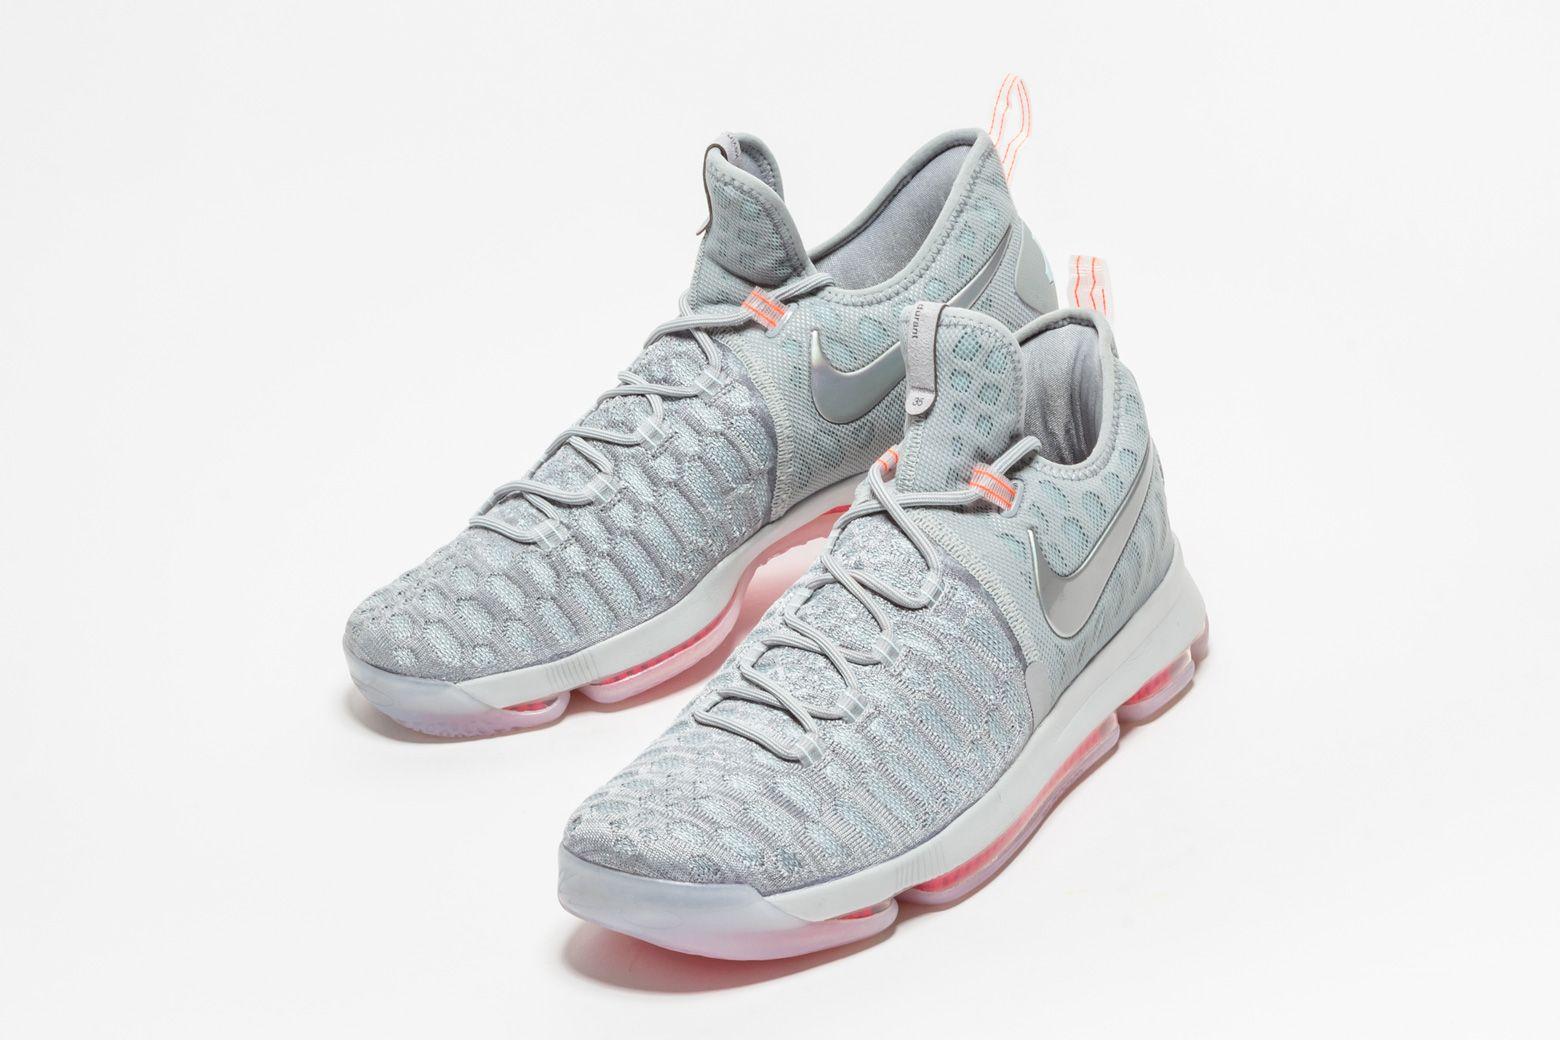 Nike Zoom Kd 9 Lmtd Pre Heat 843396 090 In 2020 Girls Basketball Shoes White Basketball Shoes Volleyball Shoes